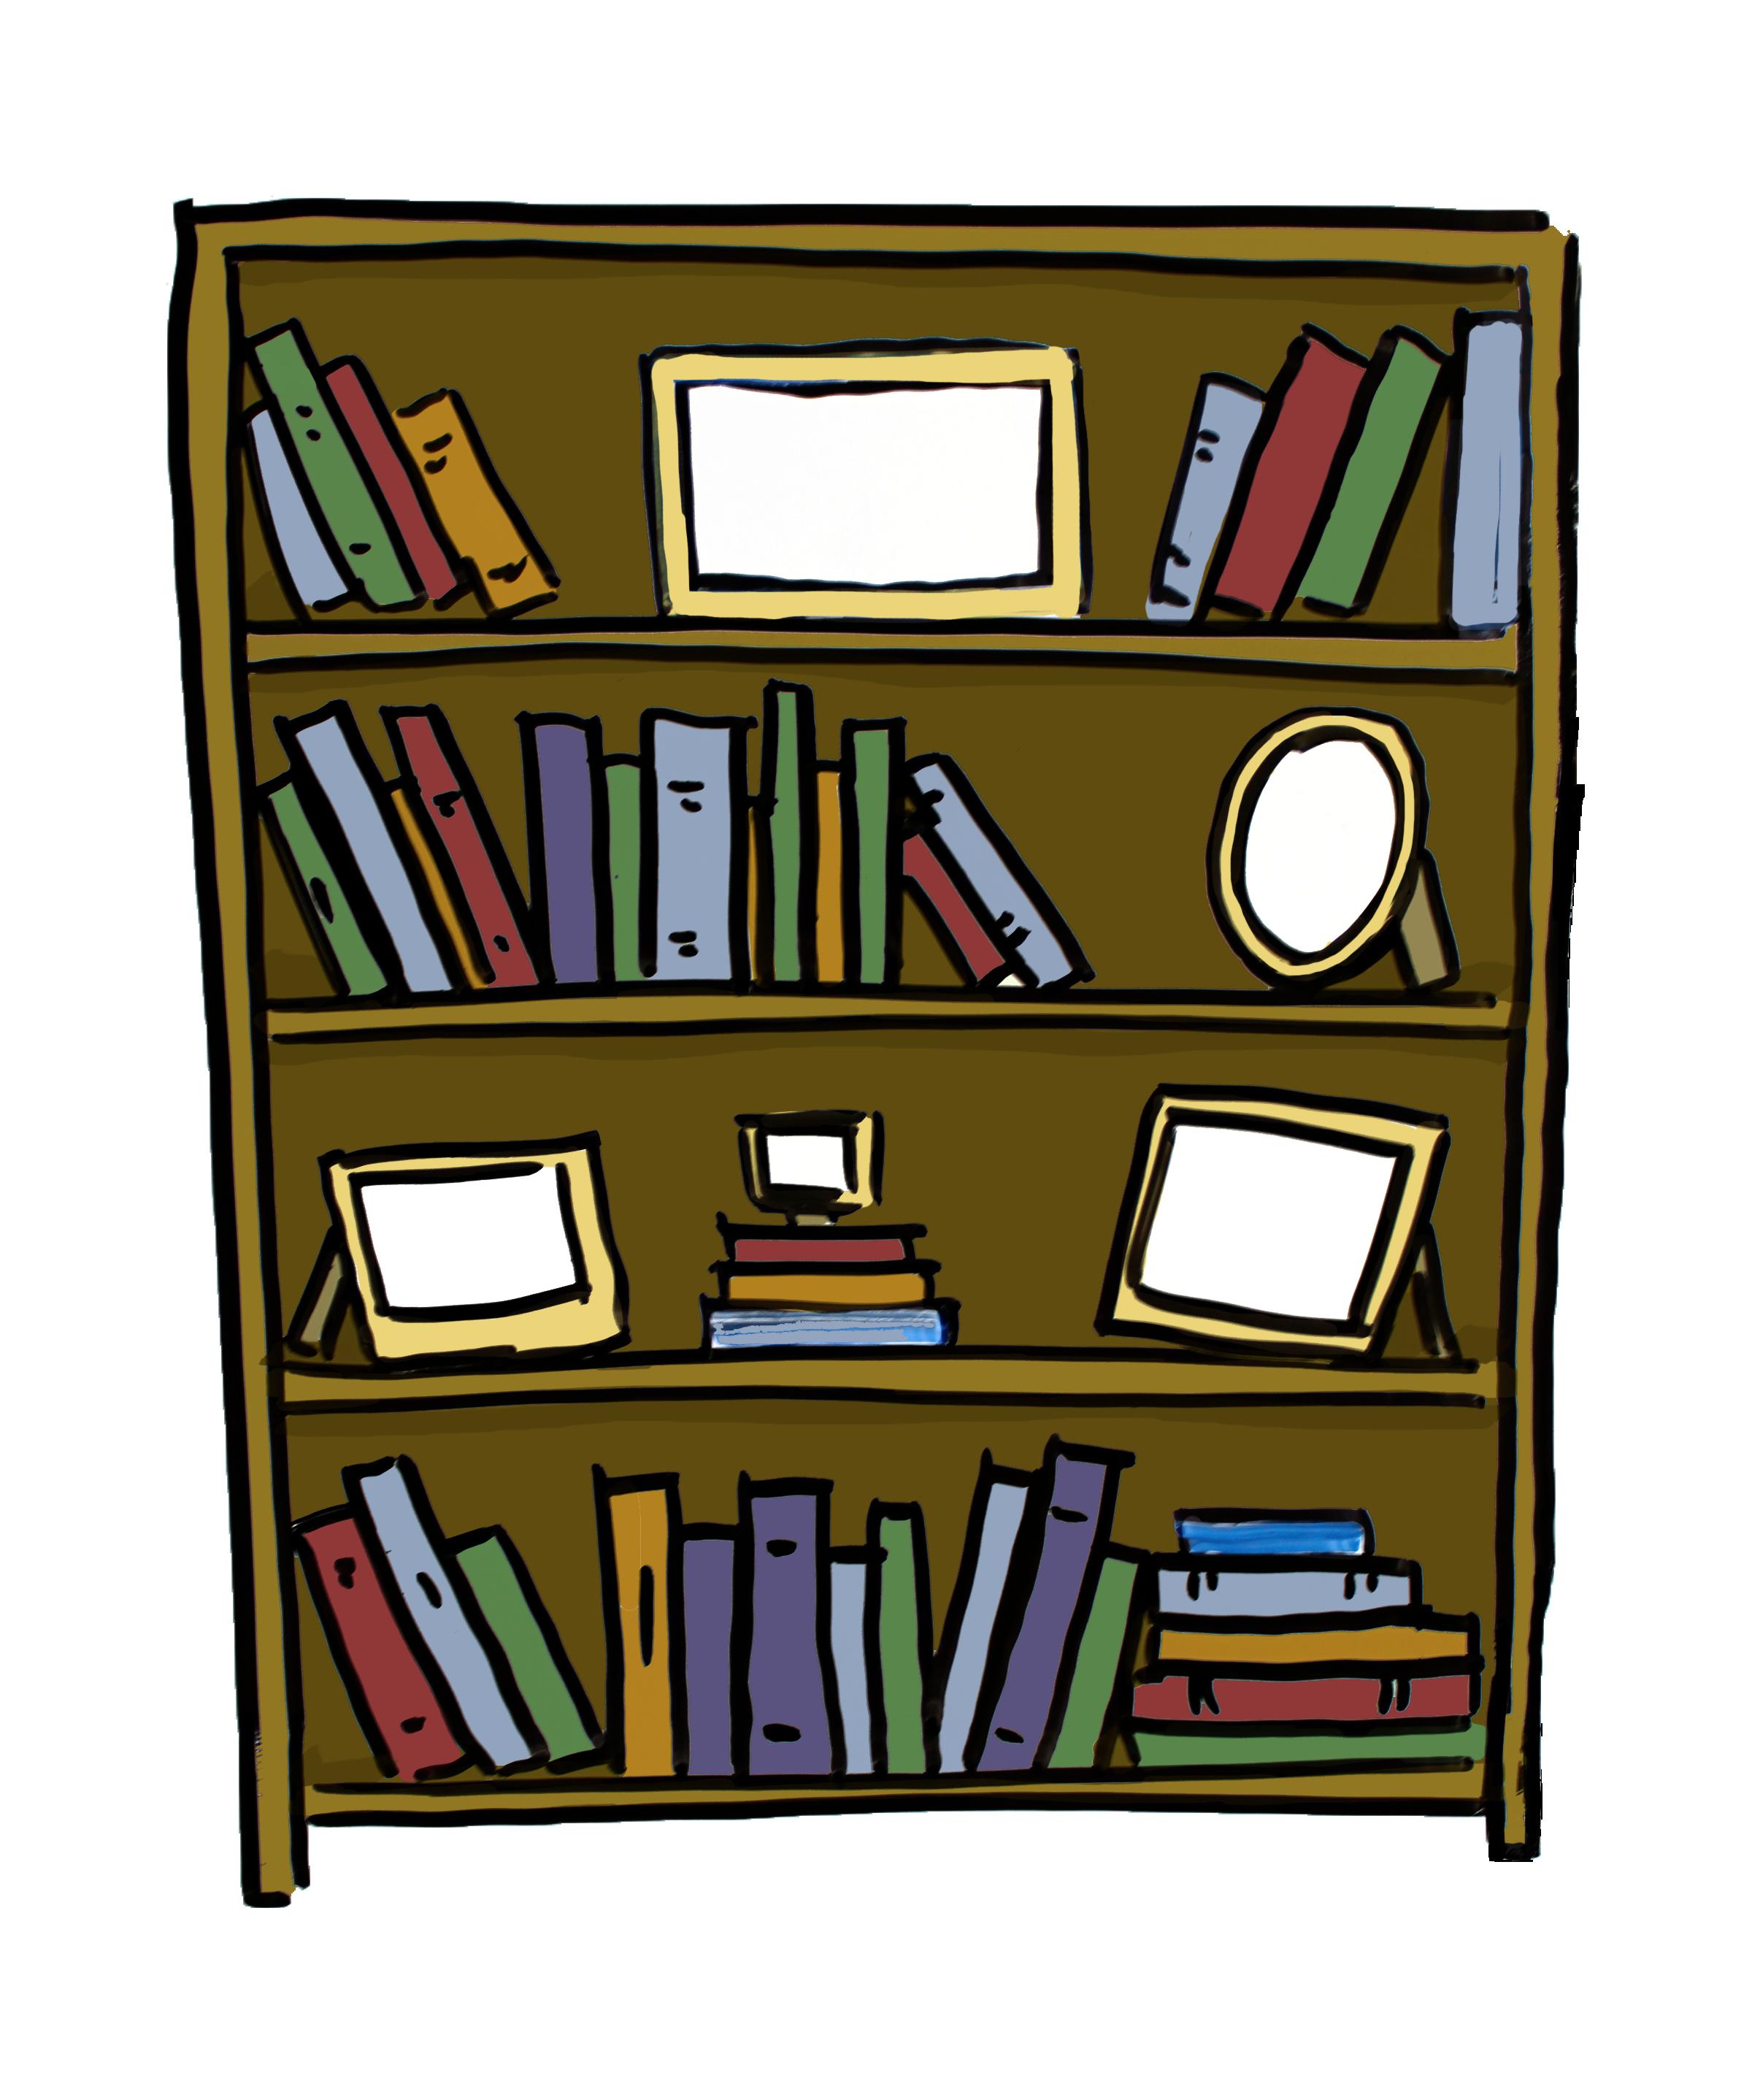 Furniture clipart bookshelf.  d colour next